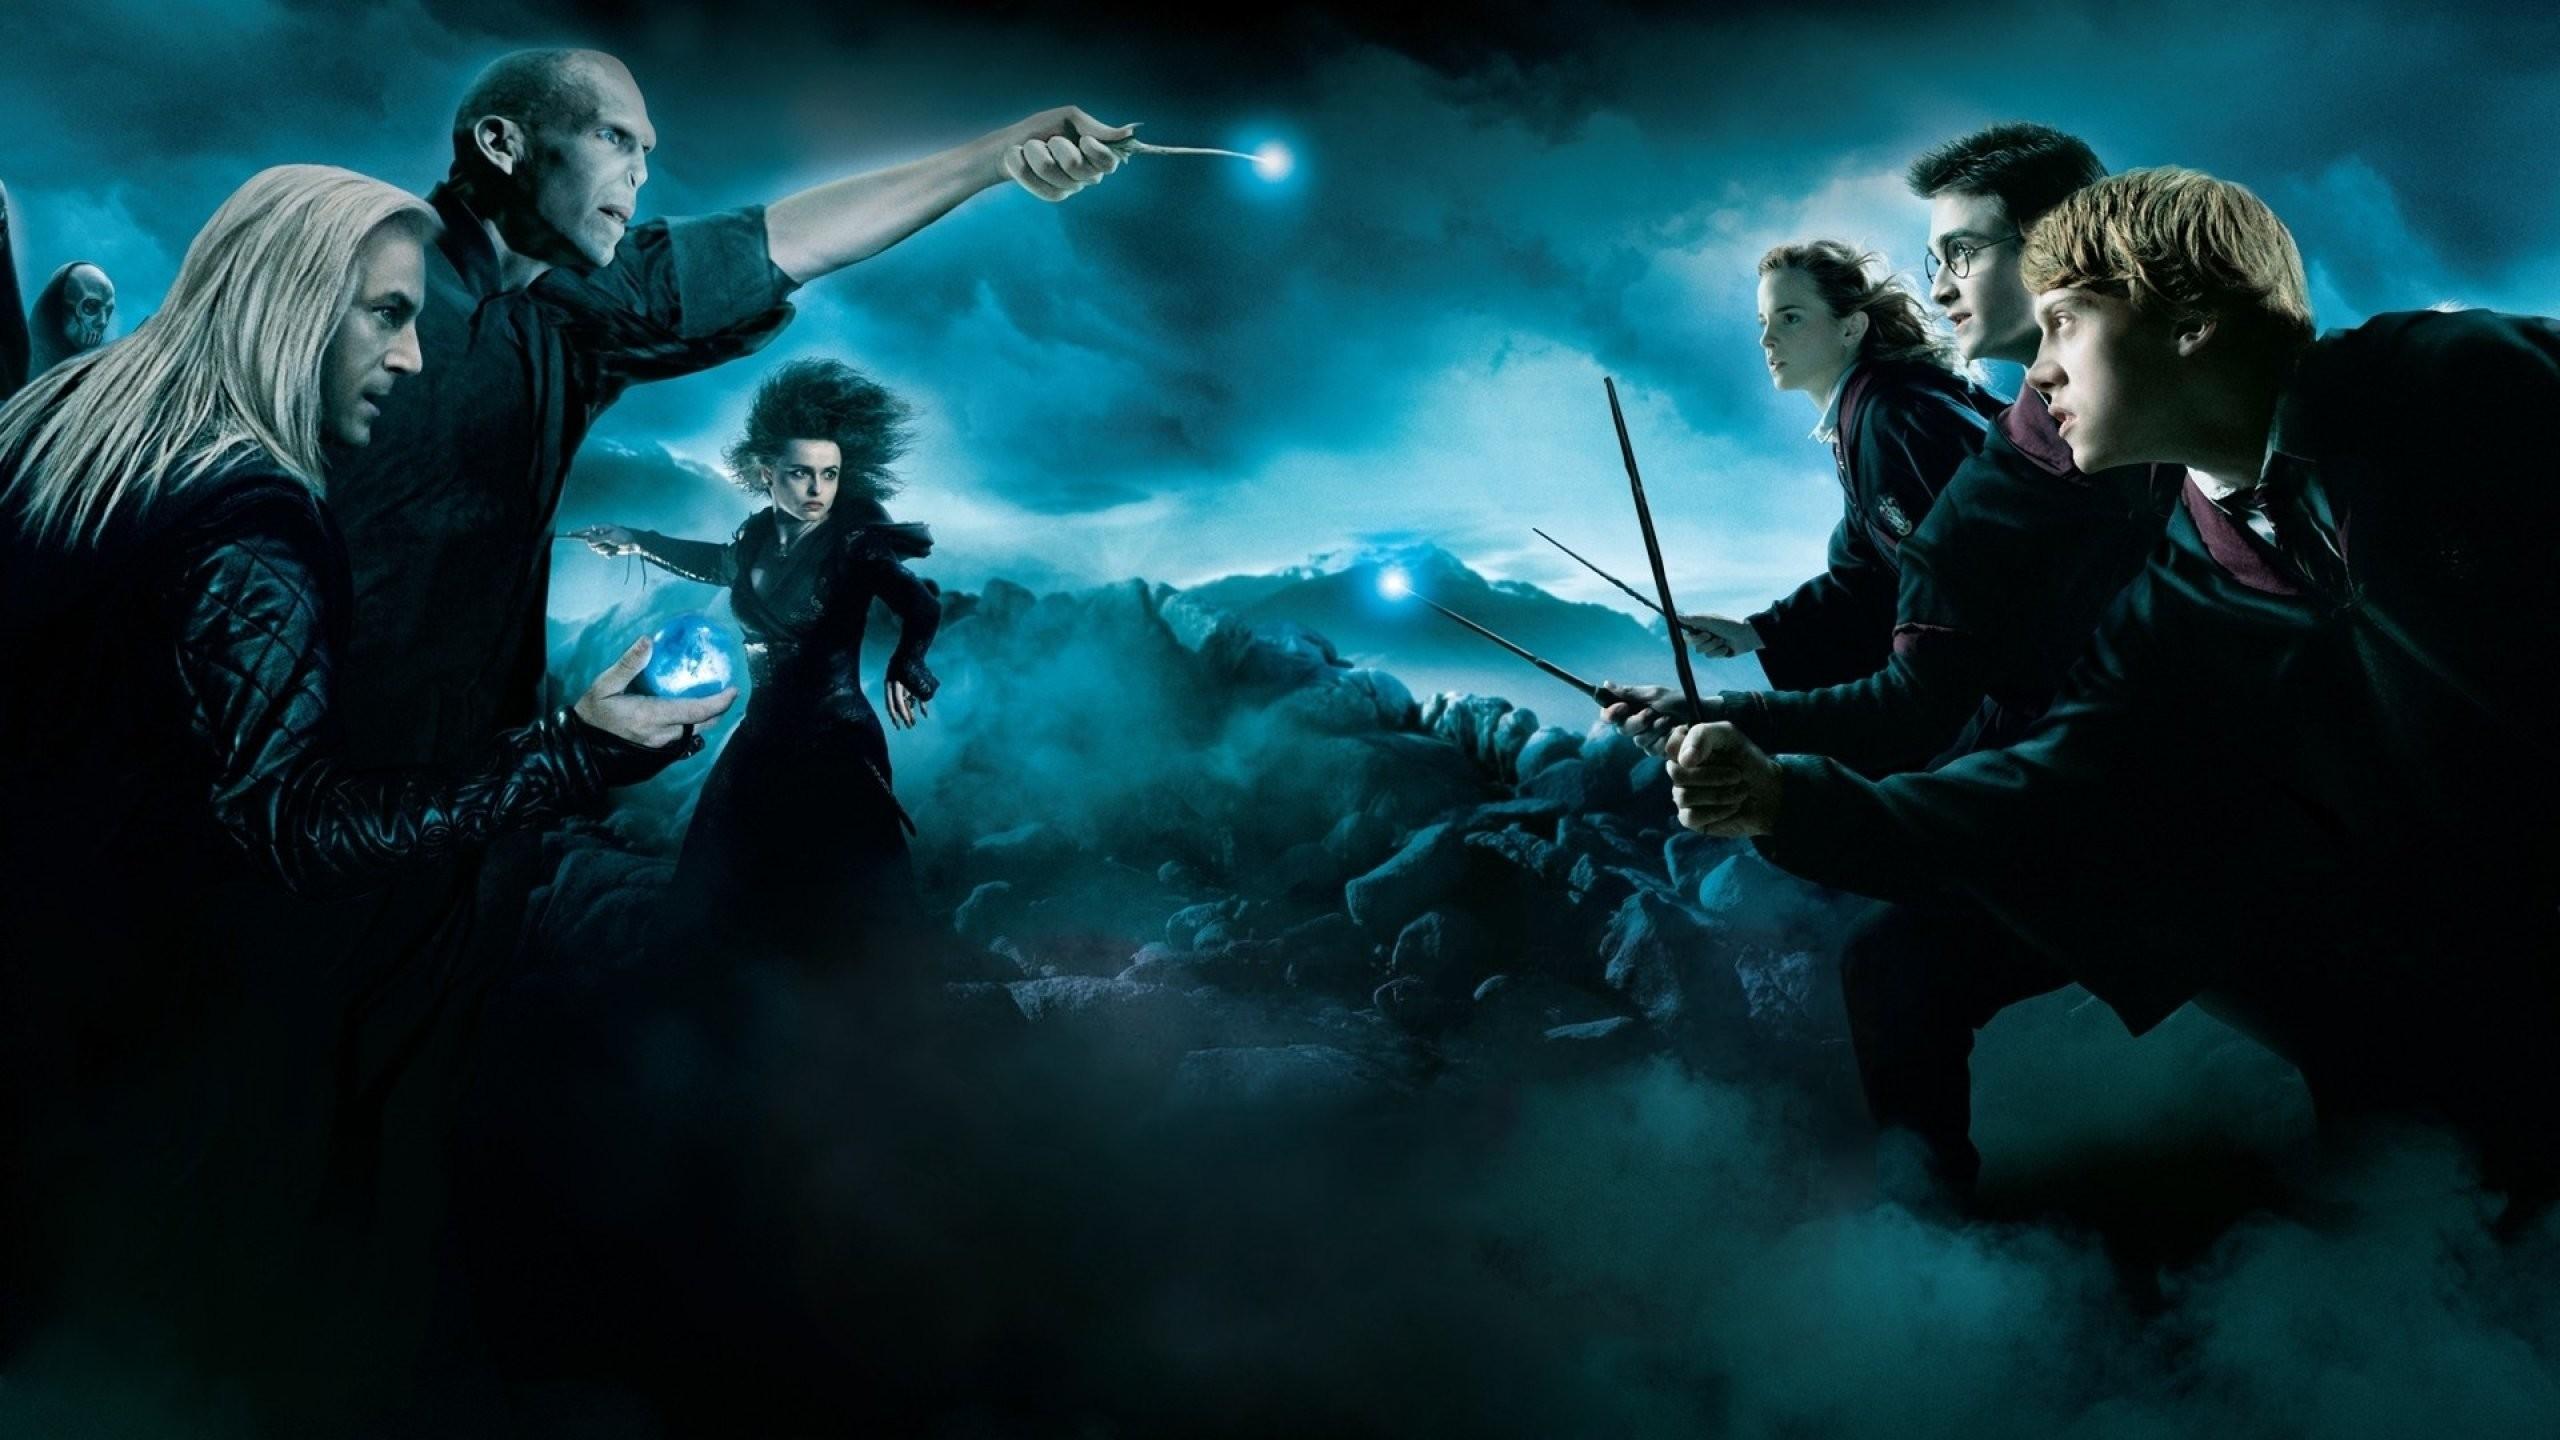 Amazing Wallpaper Mac Harry Potter - 263205  2018_87224.jpg